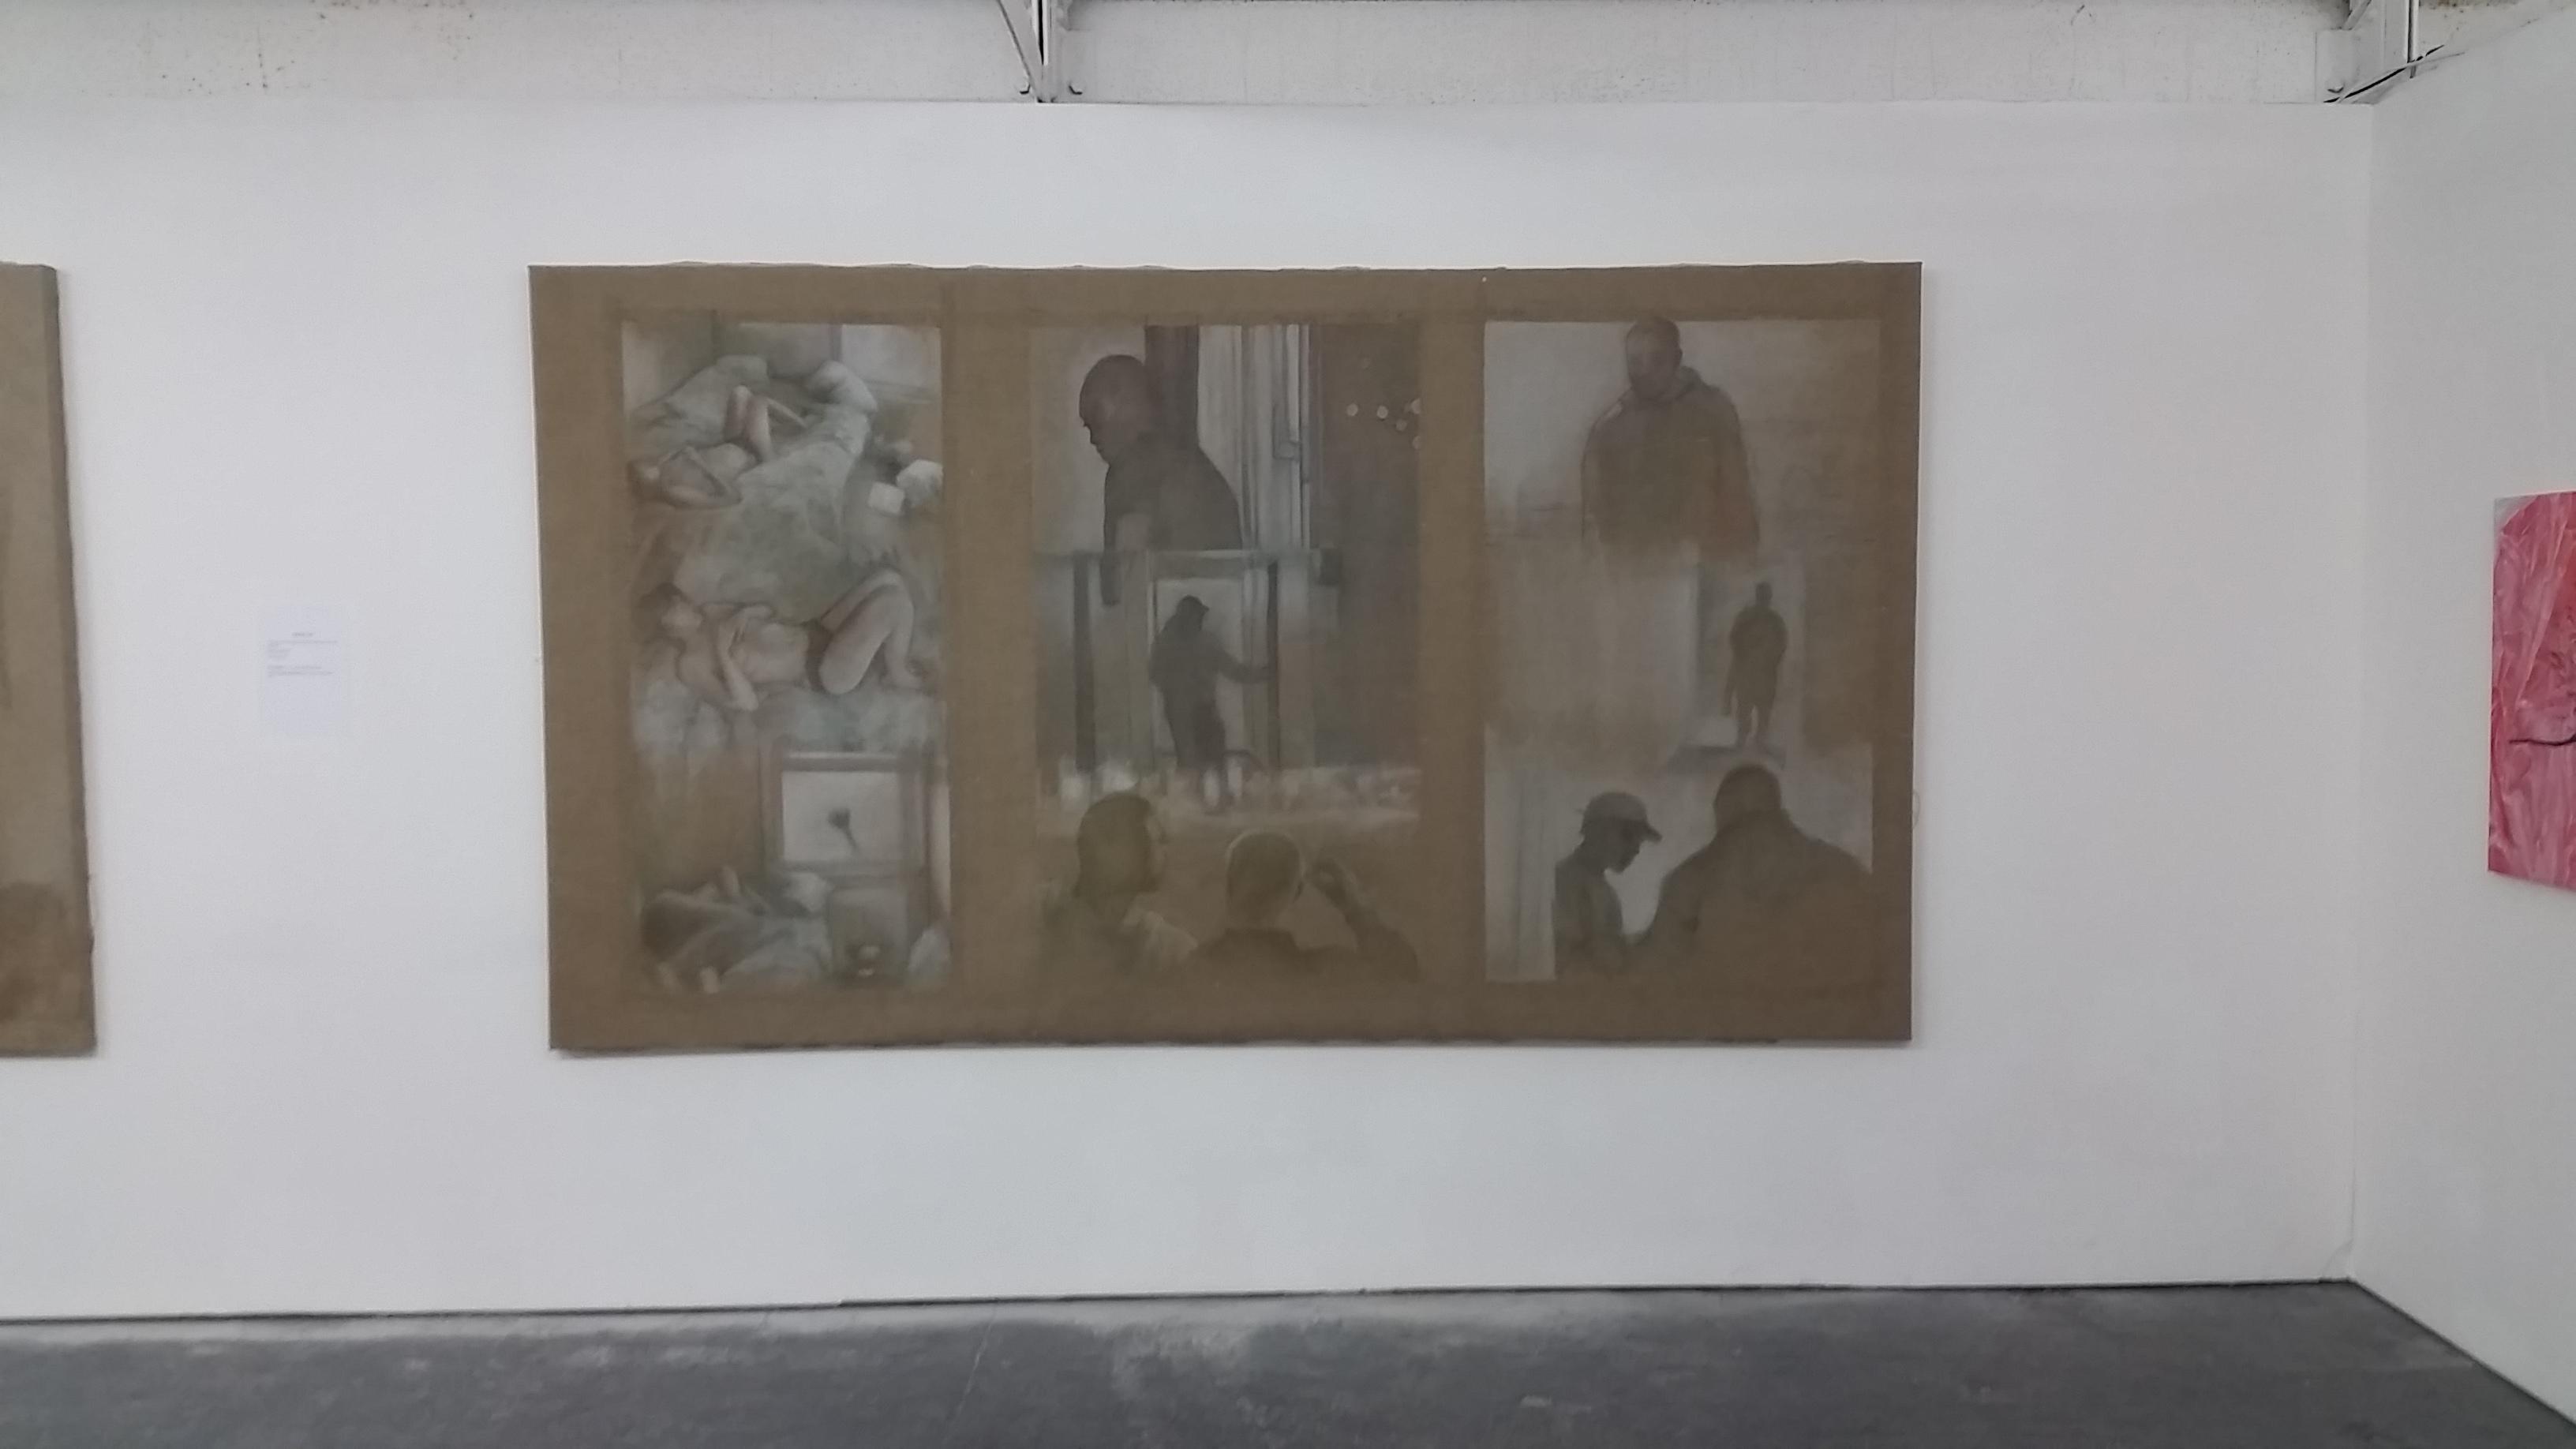 Sensei gallery 2